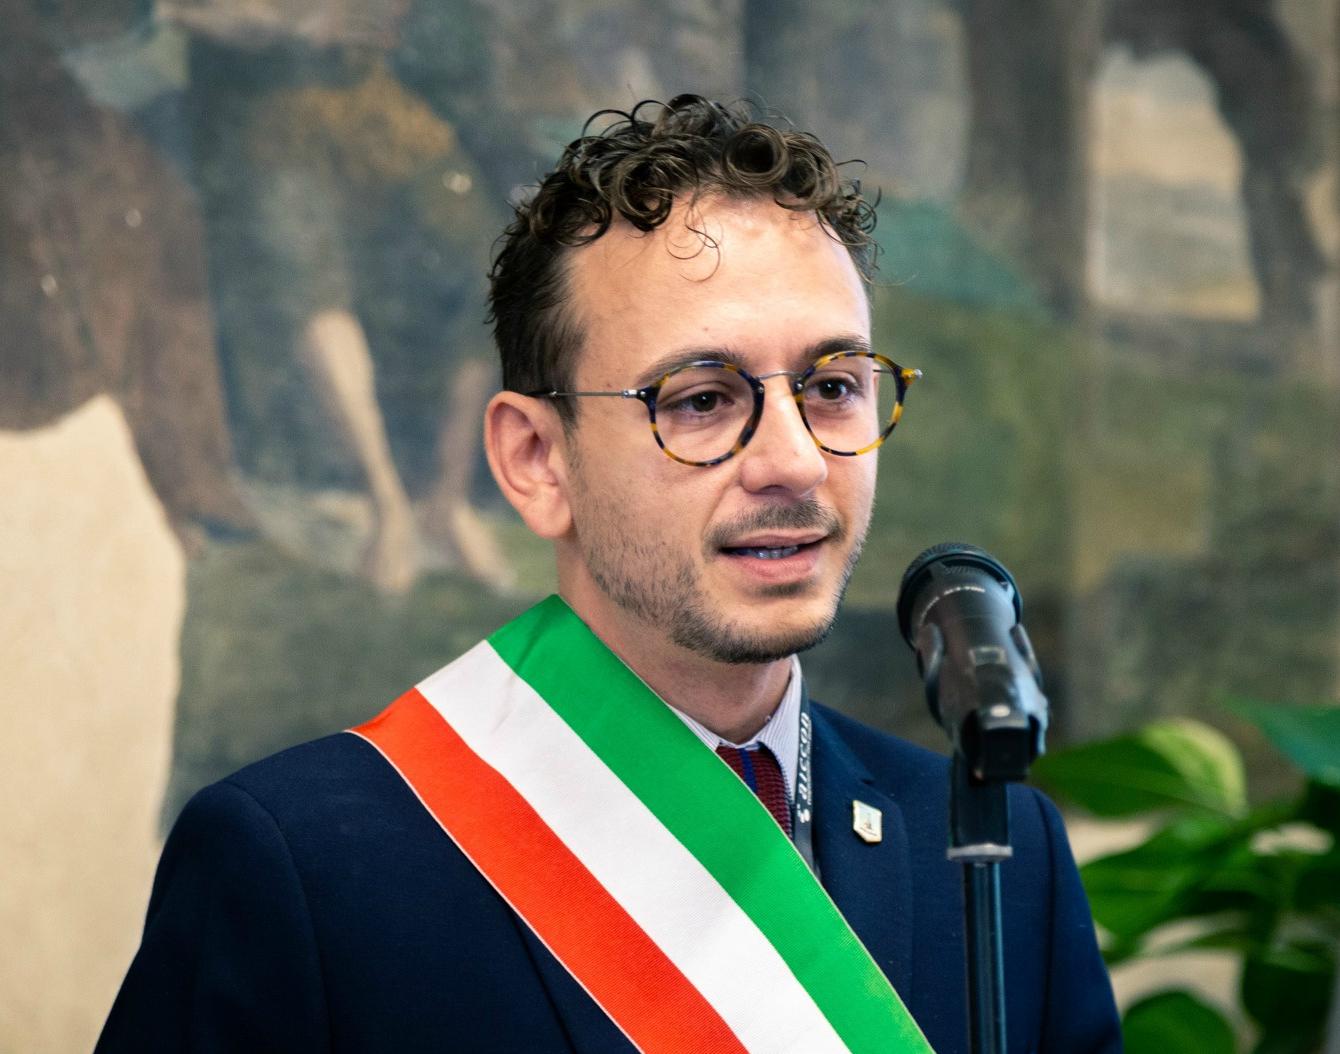 Sindaco-di-Bertinoro-Gabriele-Fratto